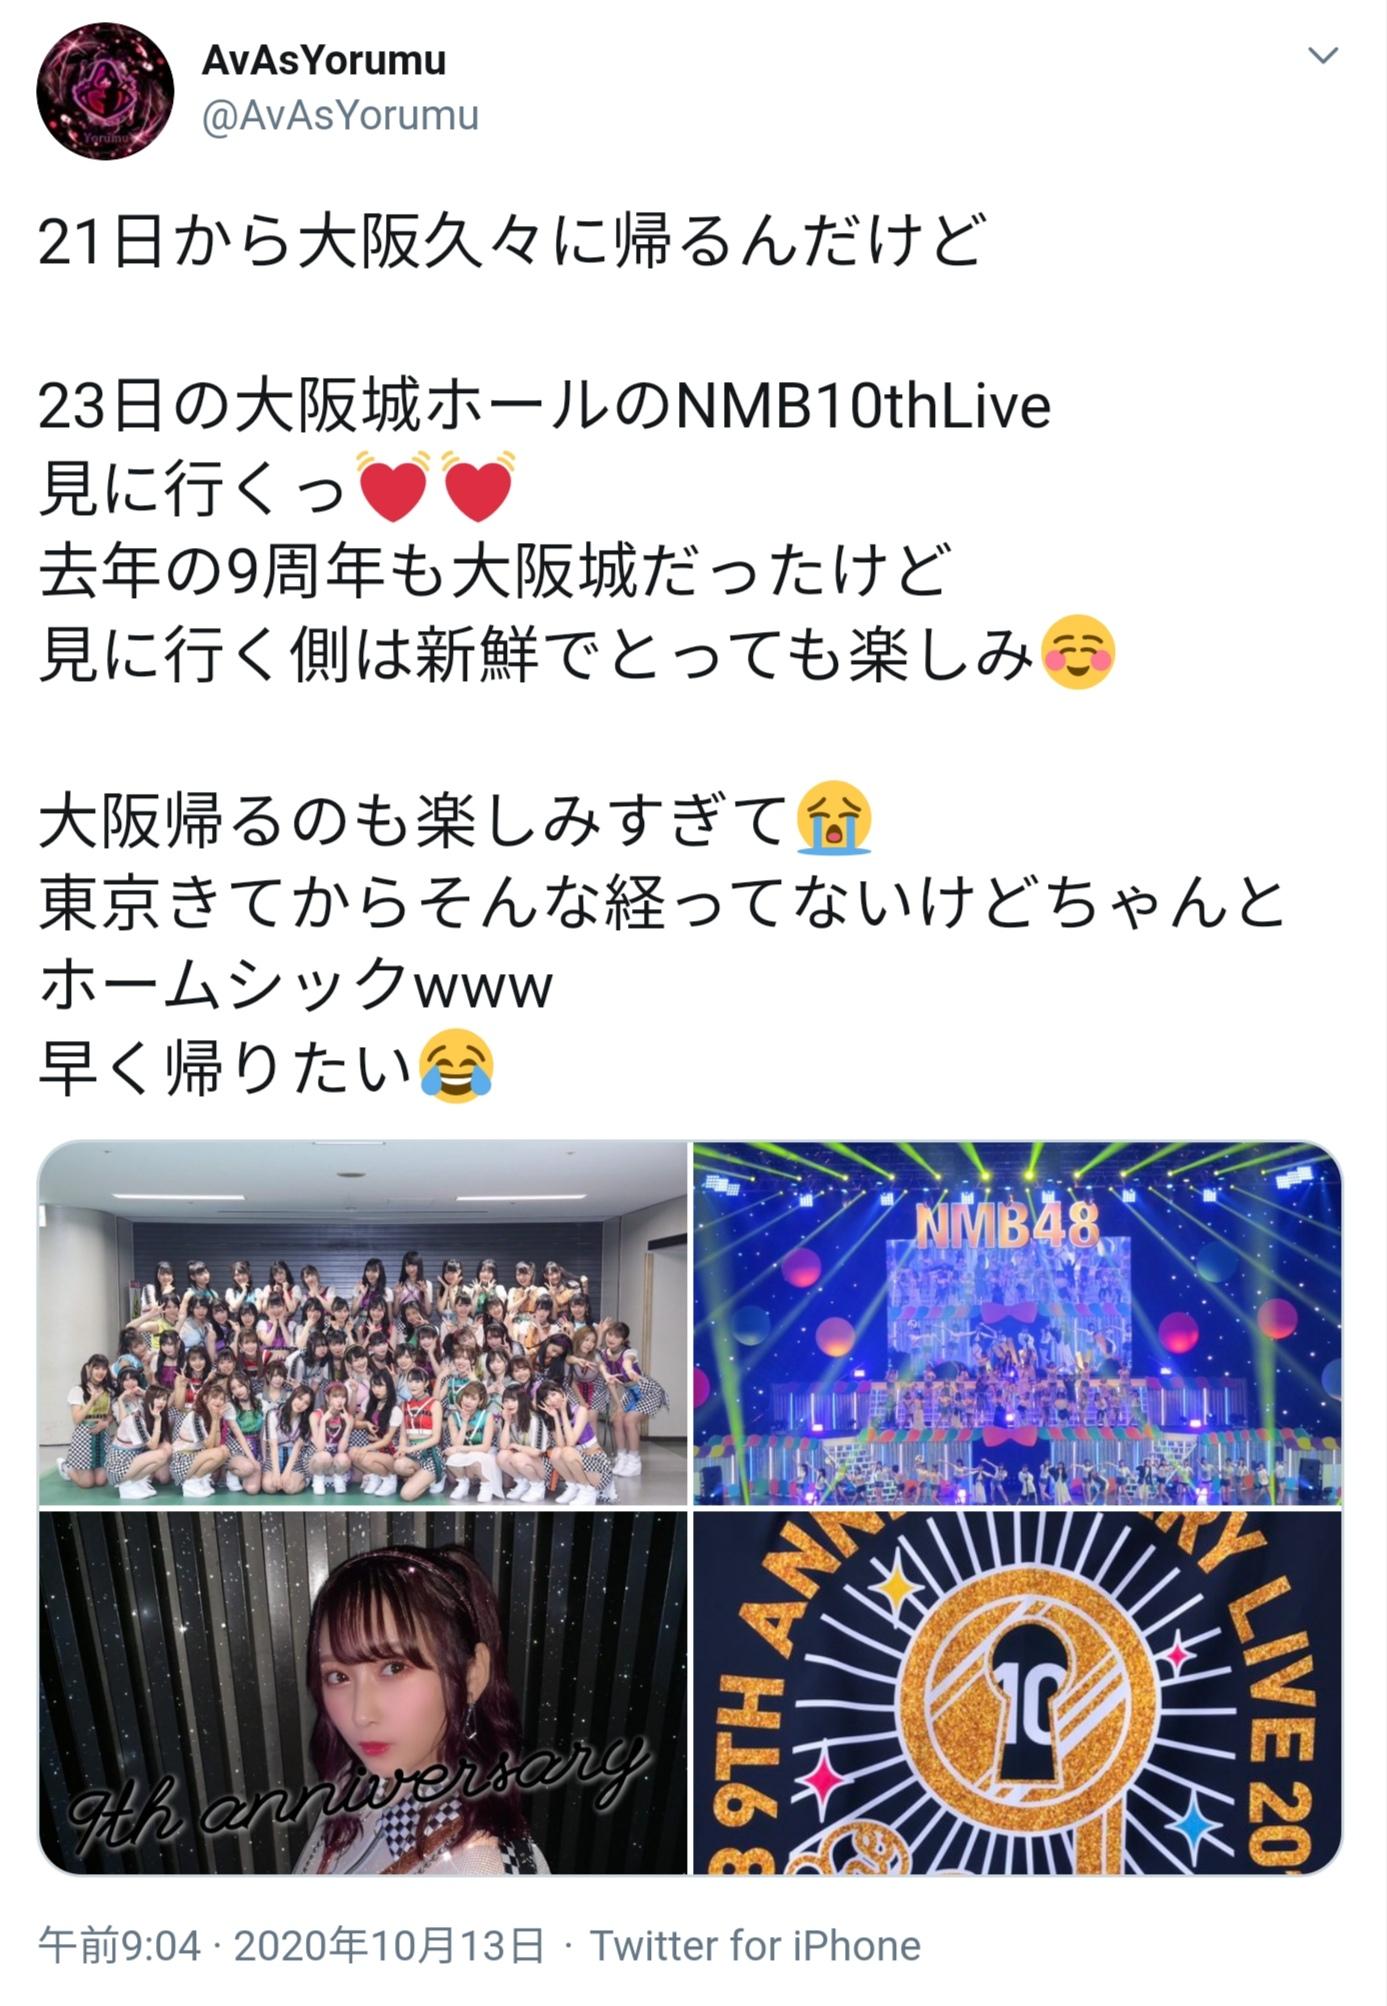 Nmb48 10 周年 ライブ